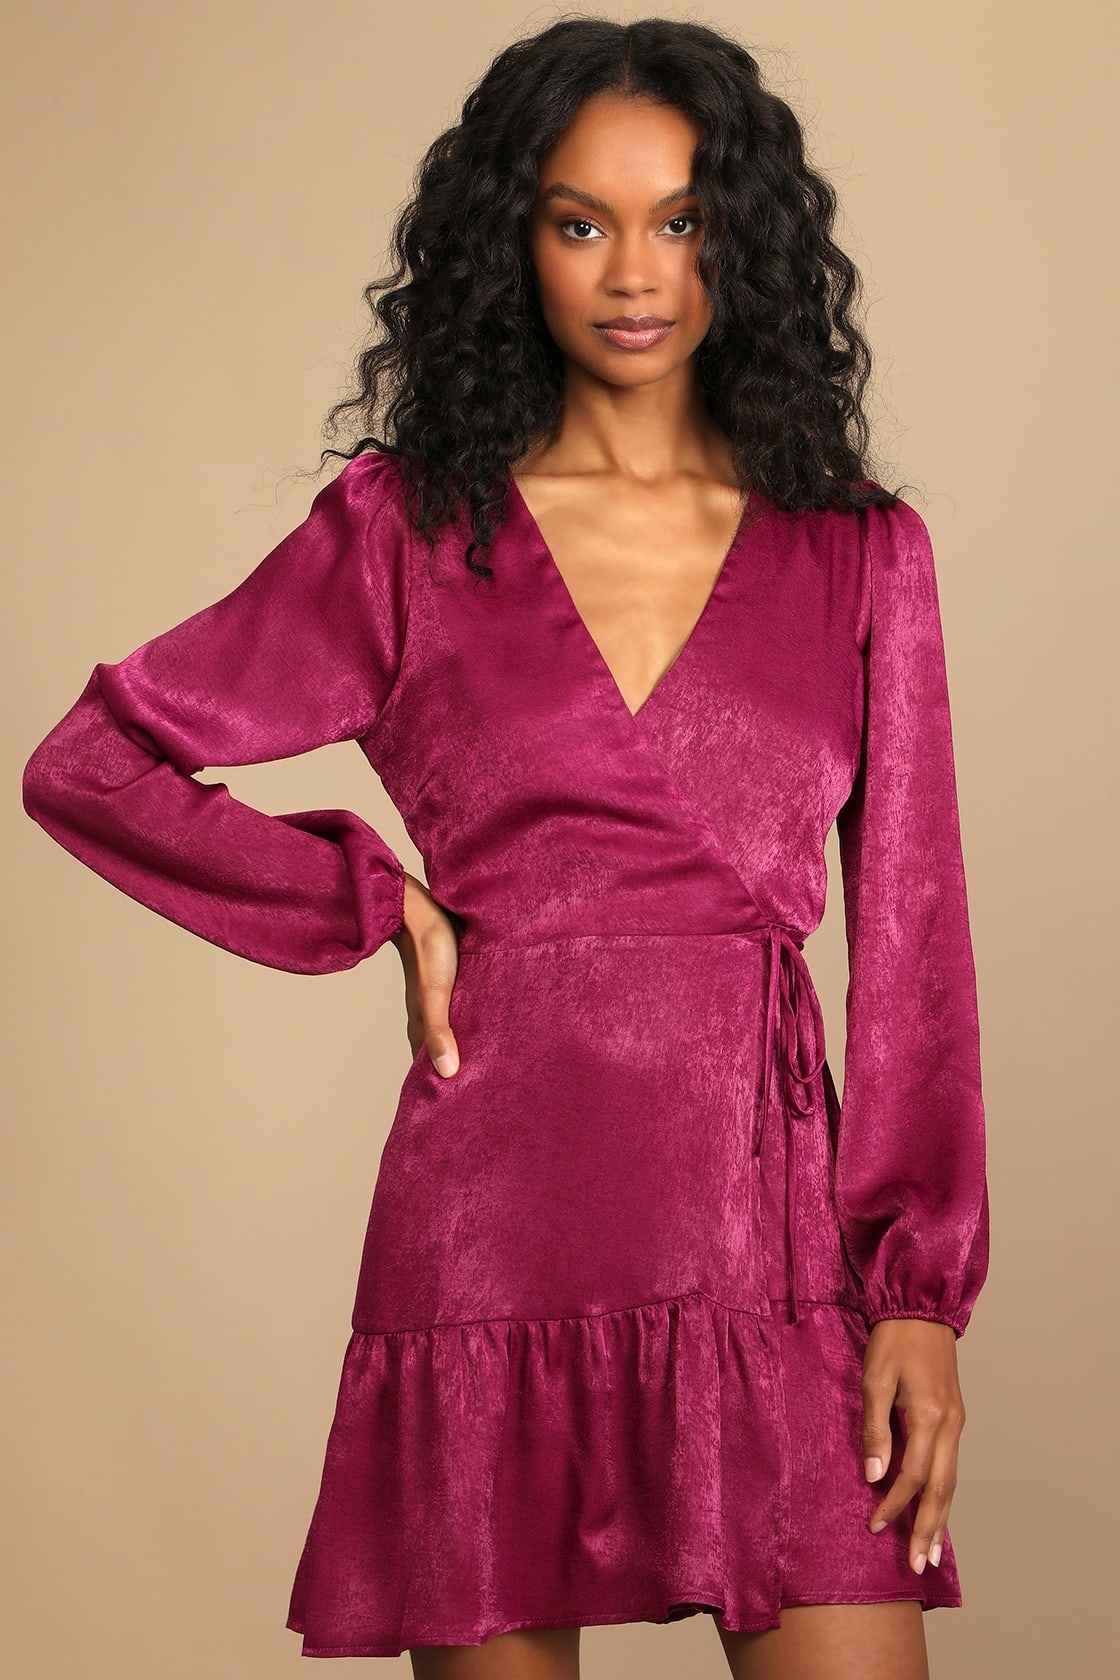 model wearing the pink satin long-sleeved wrap dress